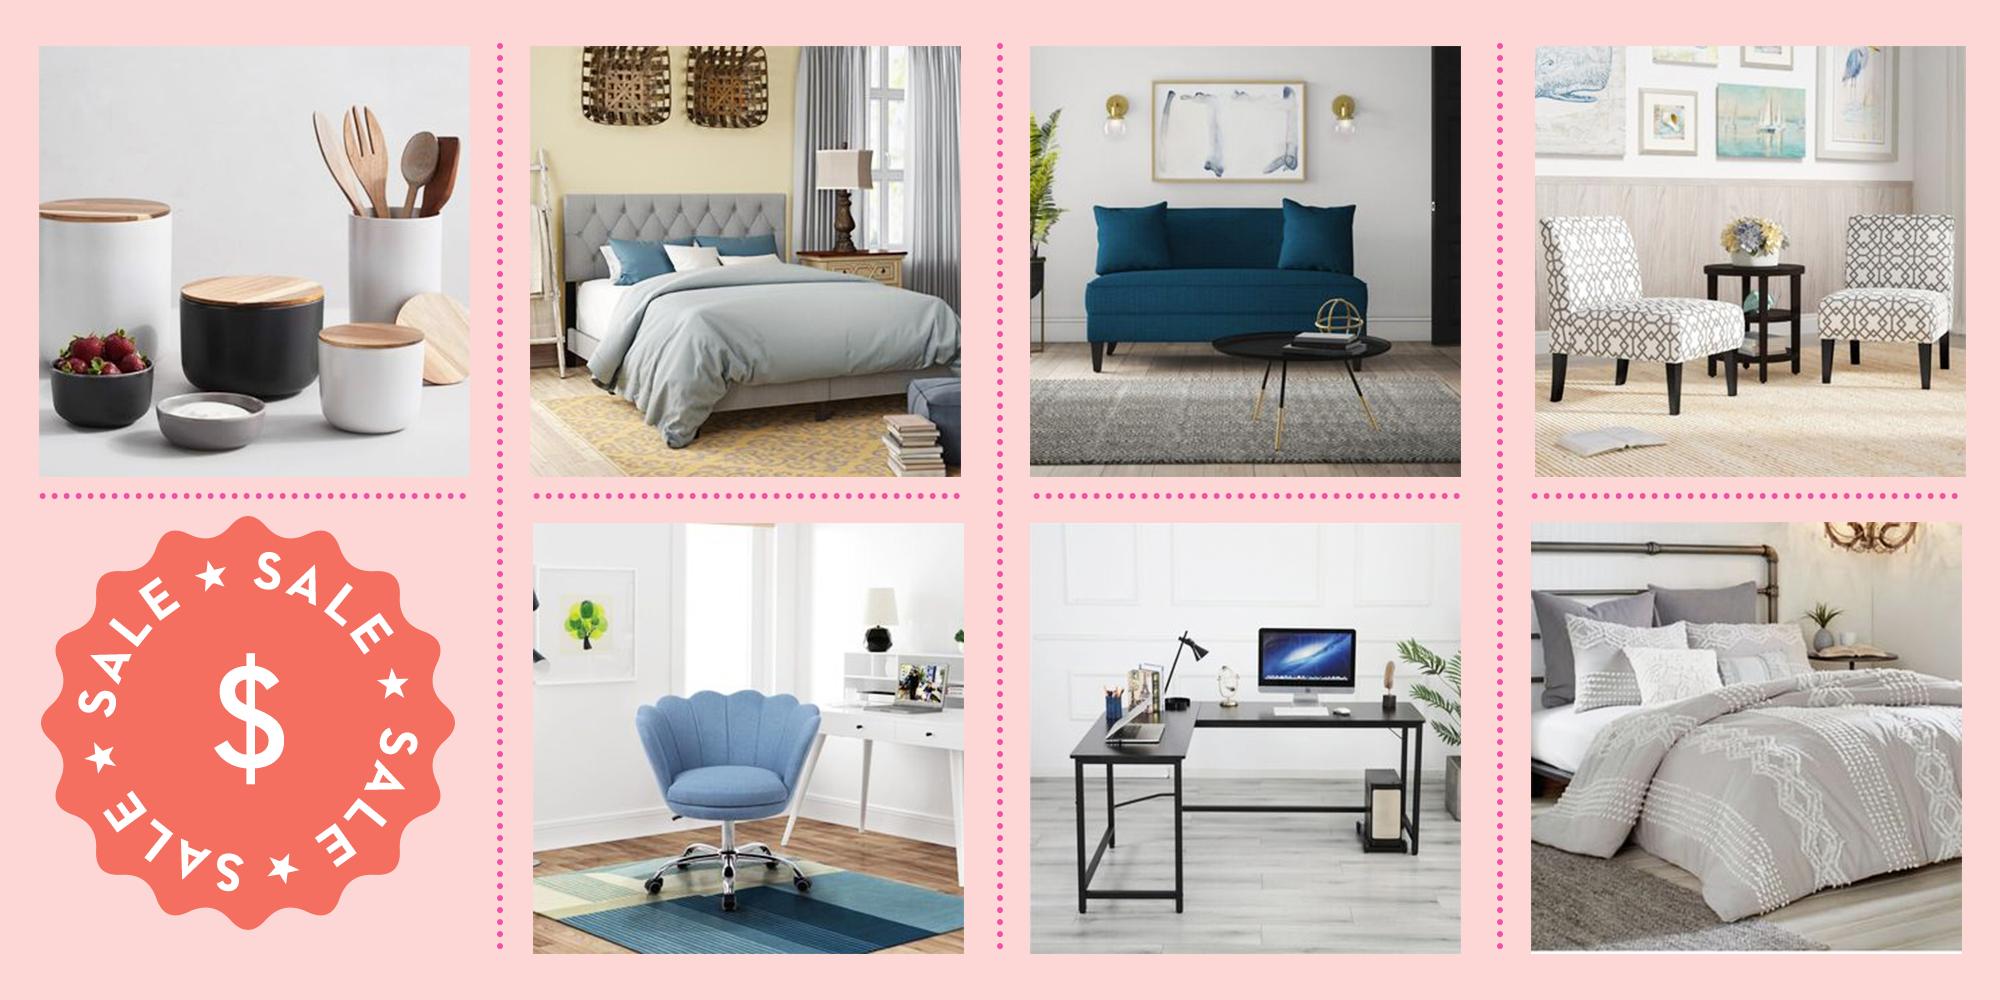 Cyber Monday Furniture Deals 5: Best Sales on Beds, Mattresses